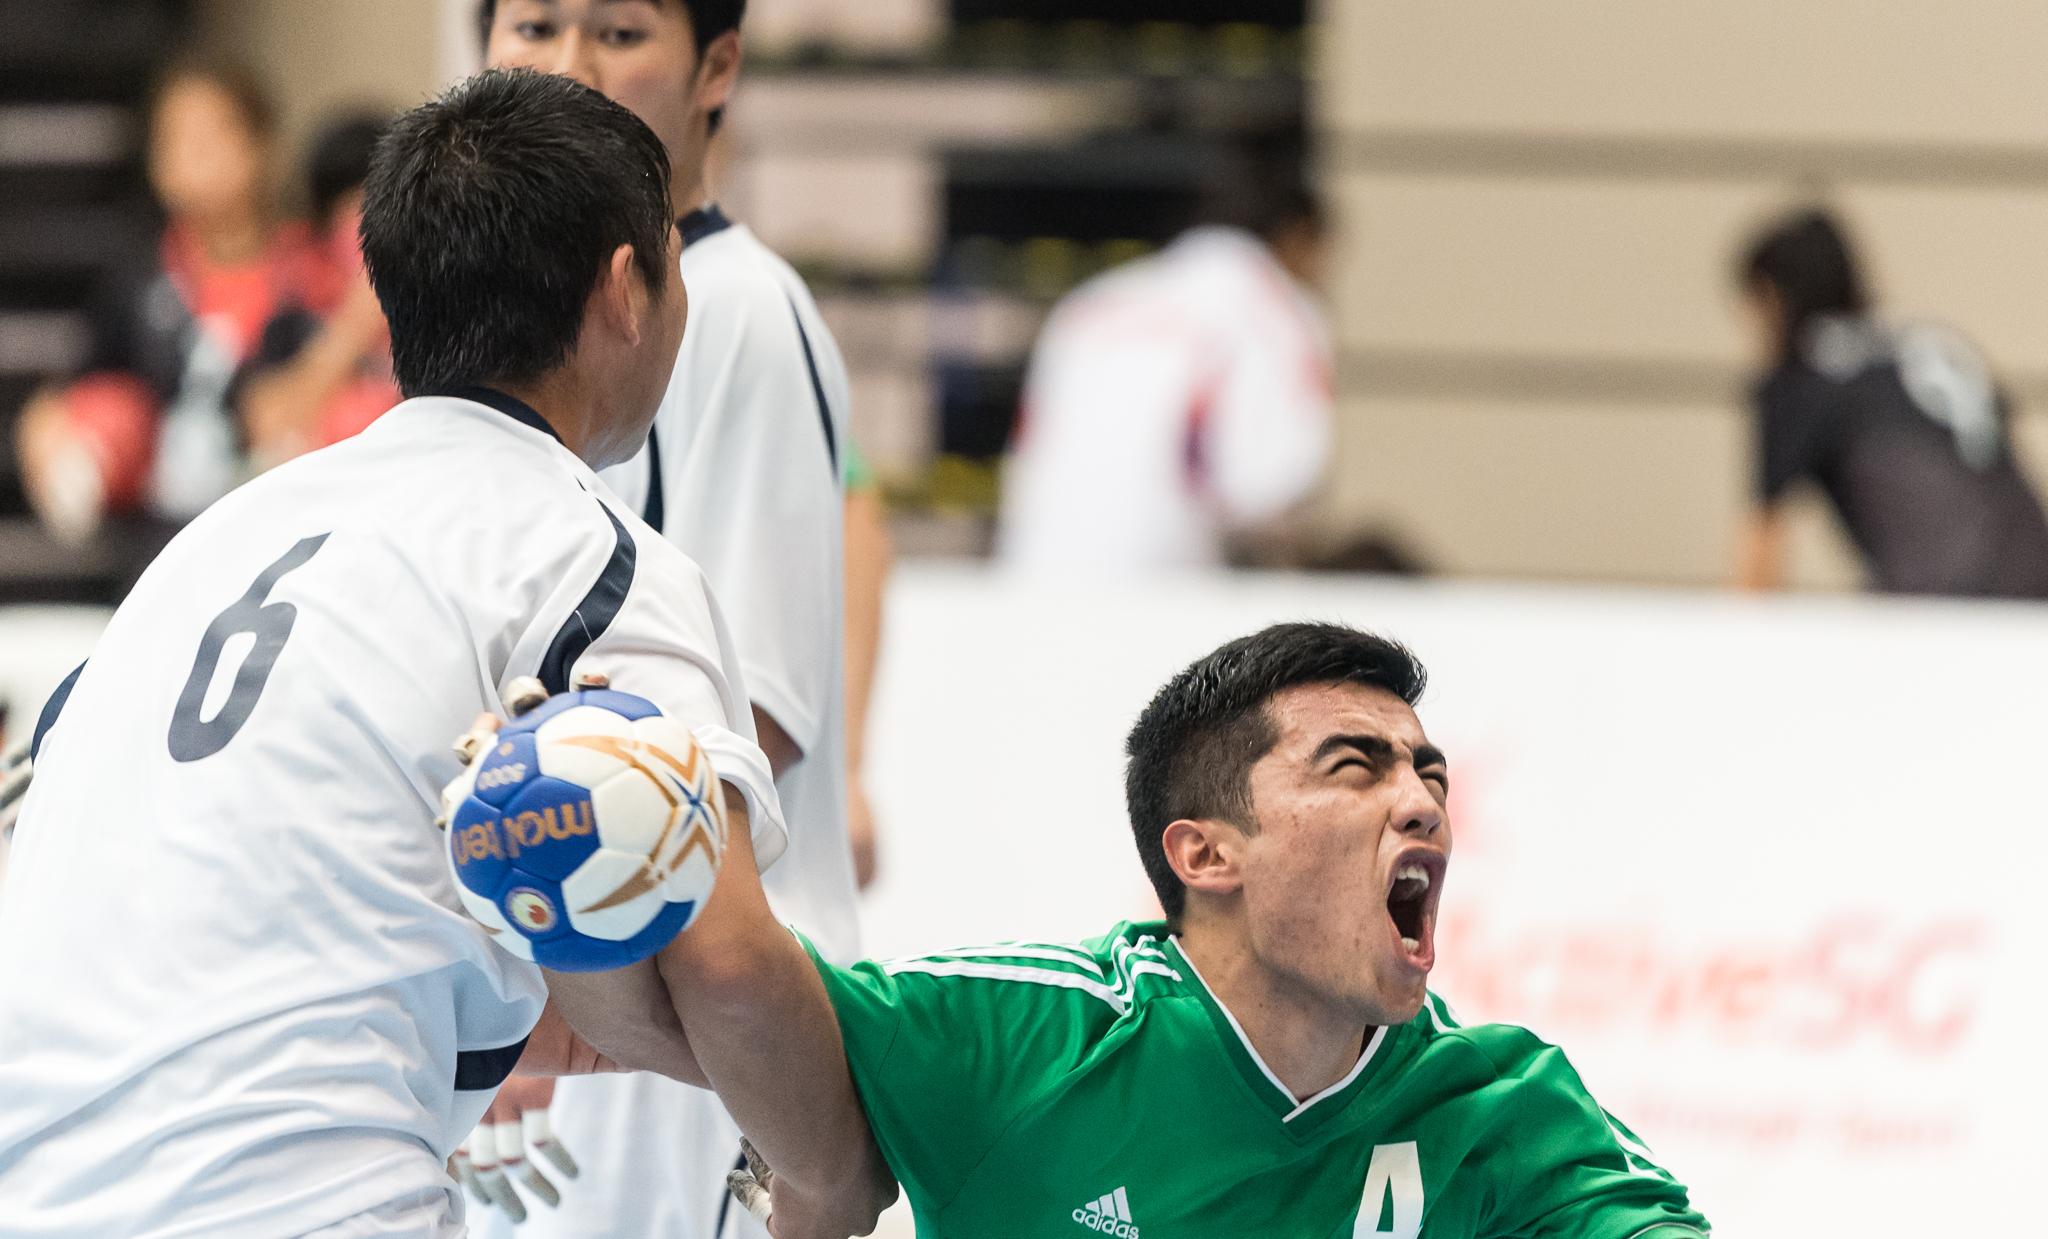 A Japanese player grabs an Uzbek player's arm during an International hand ball match at Our Tampines Hub.